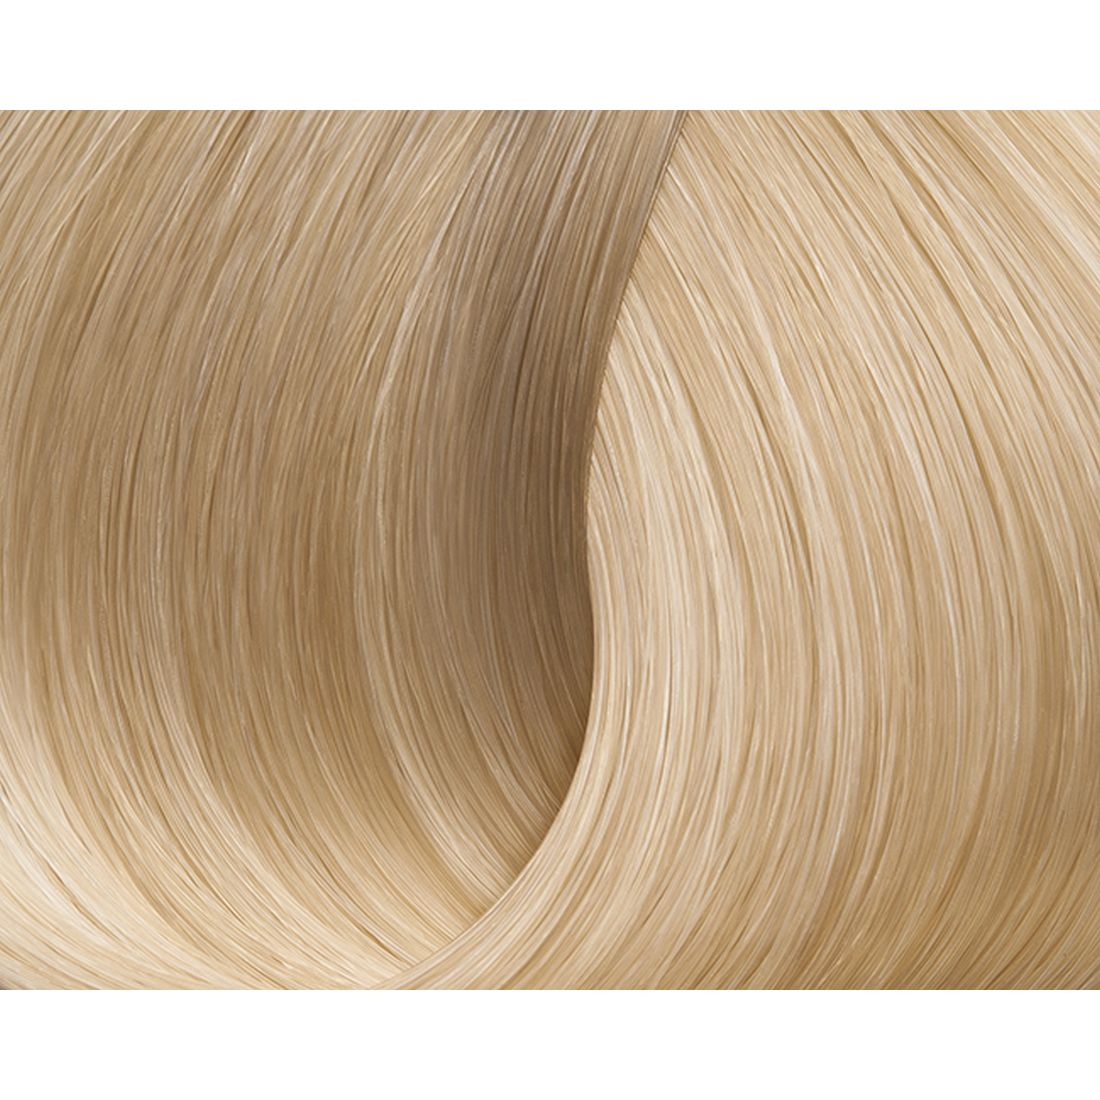 Lorvenn Beauty Color Super Blondes 1+2 Επαγγελματική Βαφή Σωληνάριο 70ml No 1001 Σαντρέ No 1001 Σαντρέ